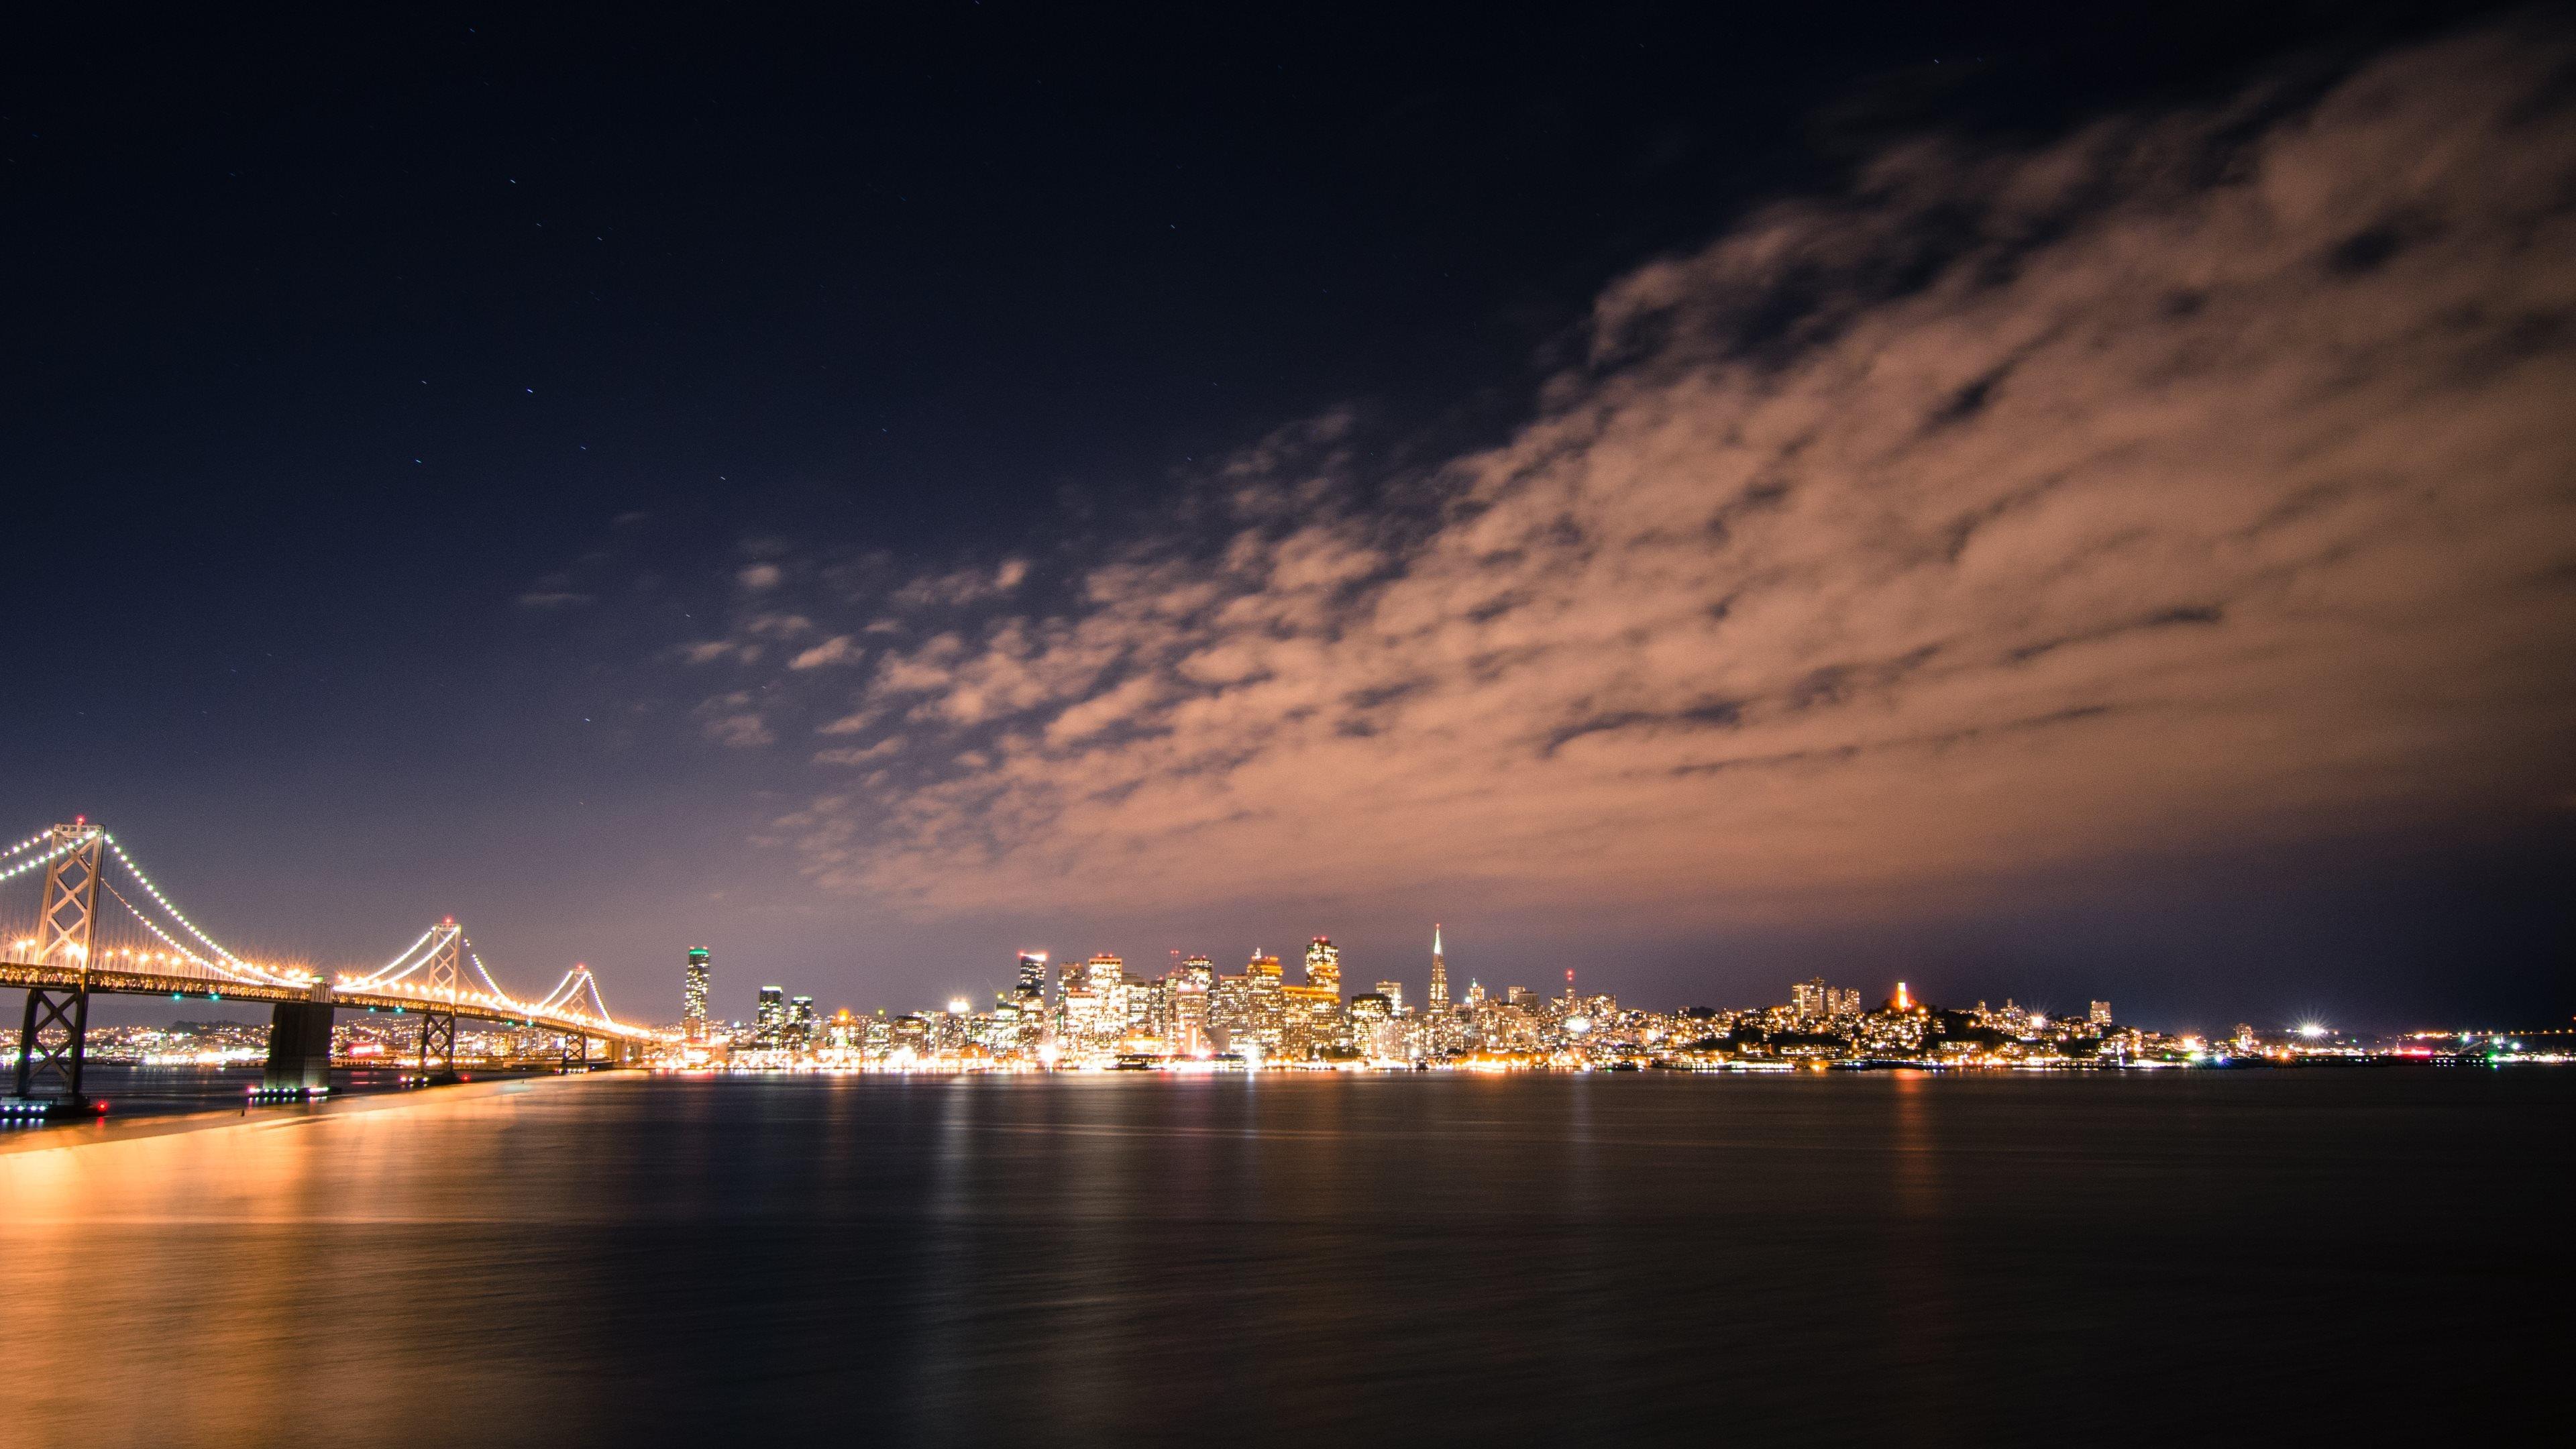 San Francisco Wallpapers 3840x2160 Ultra Hd 4k Desktop Backgrounds